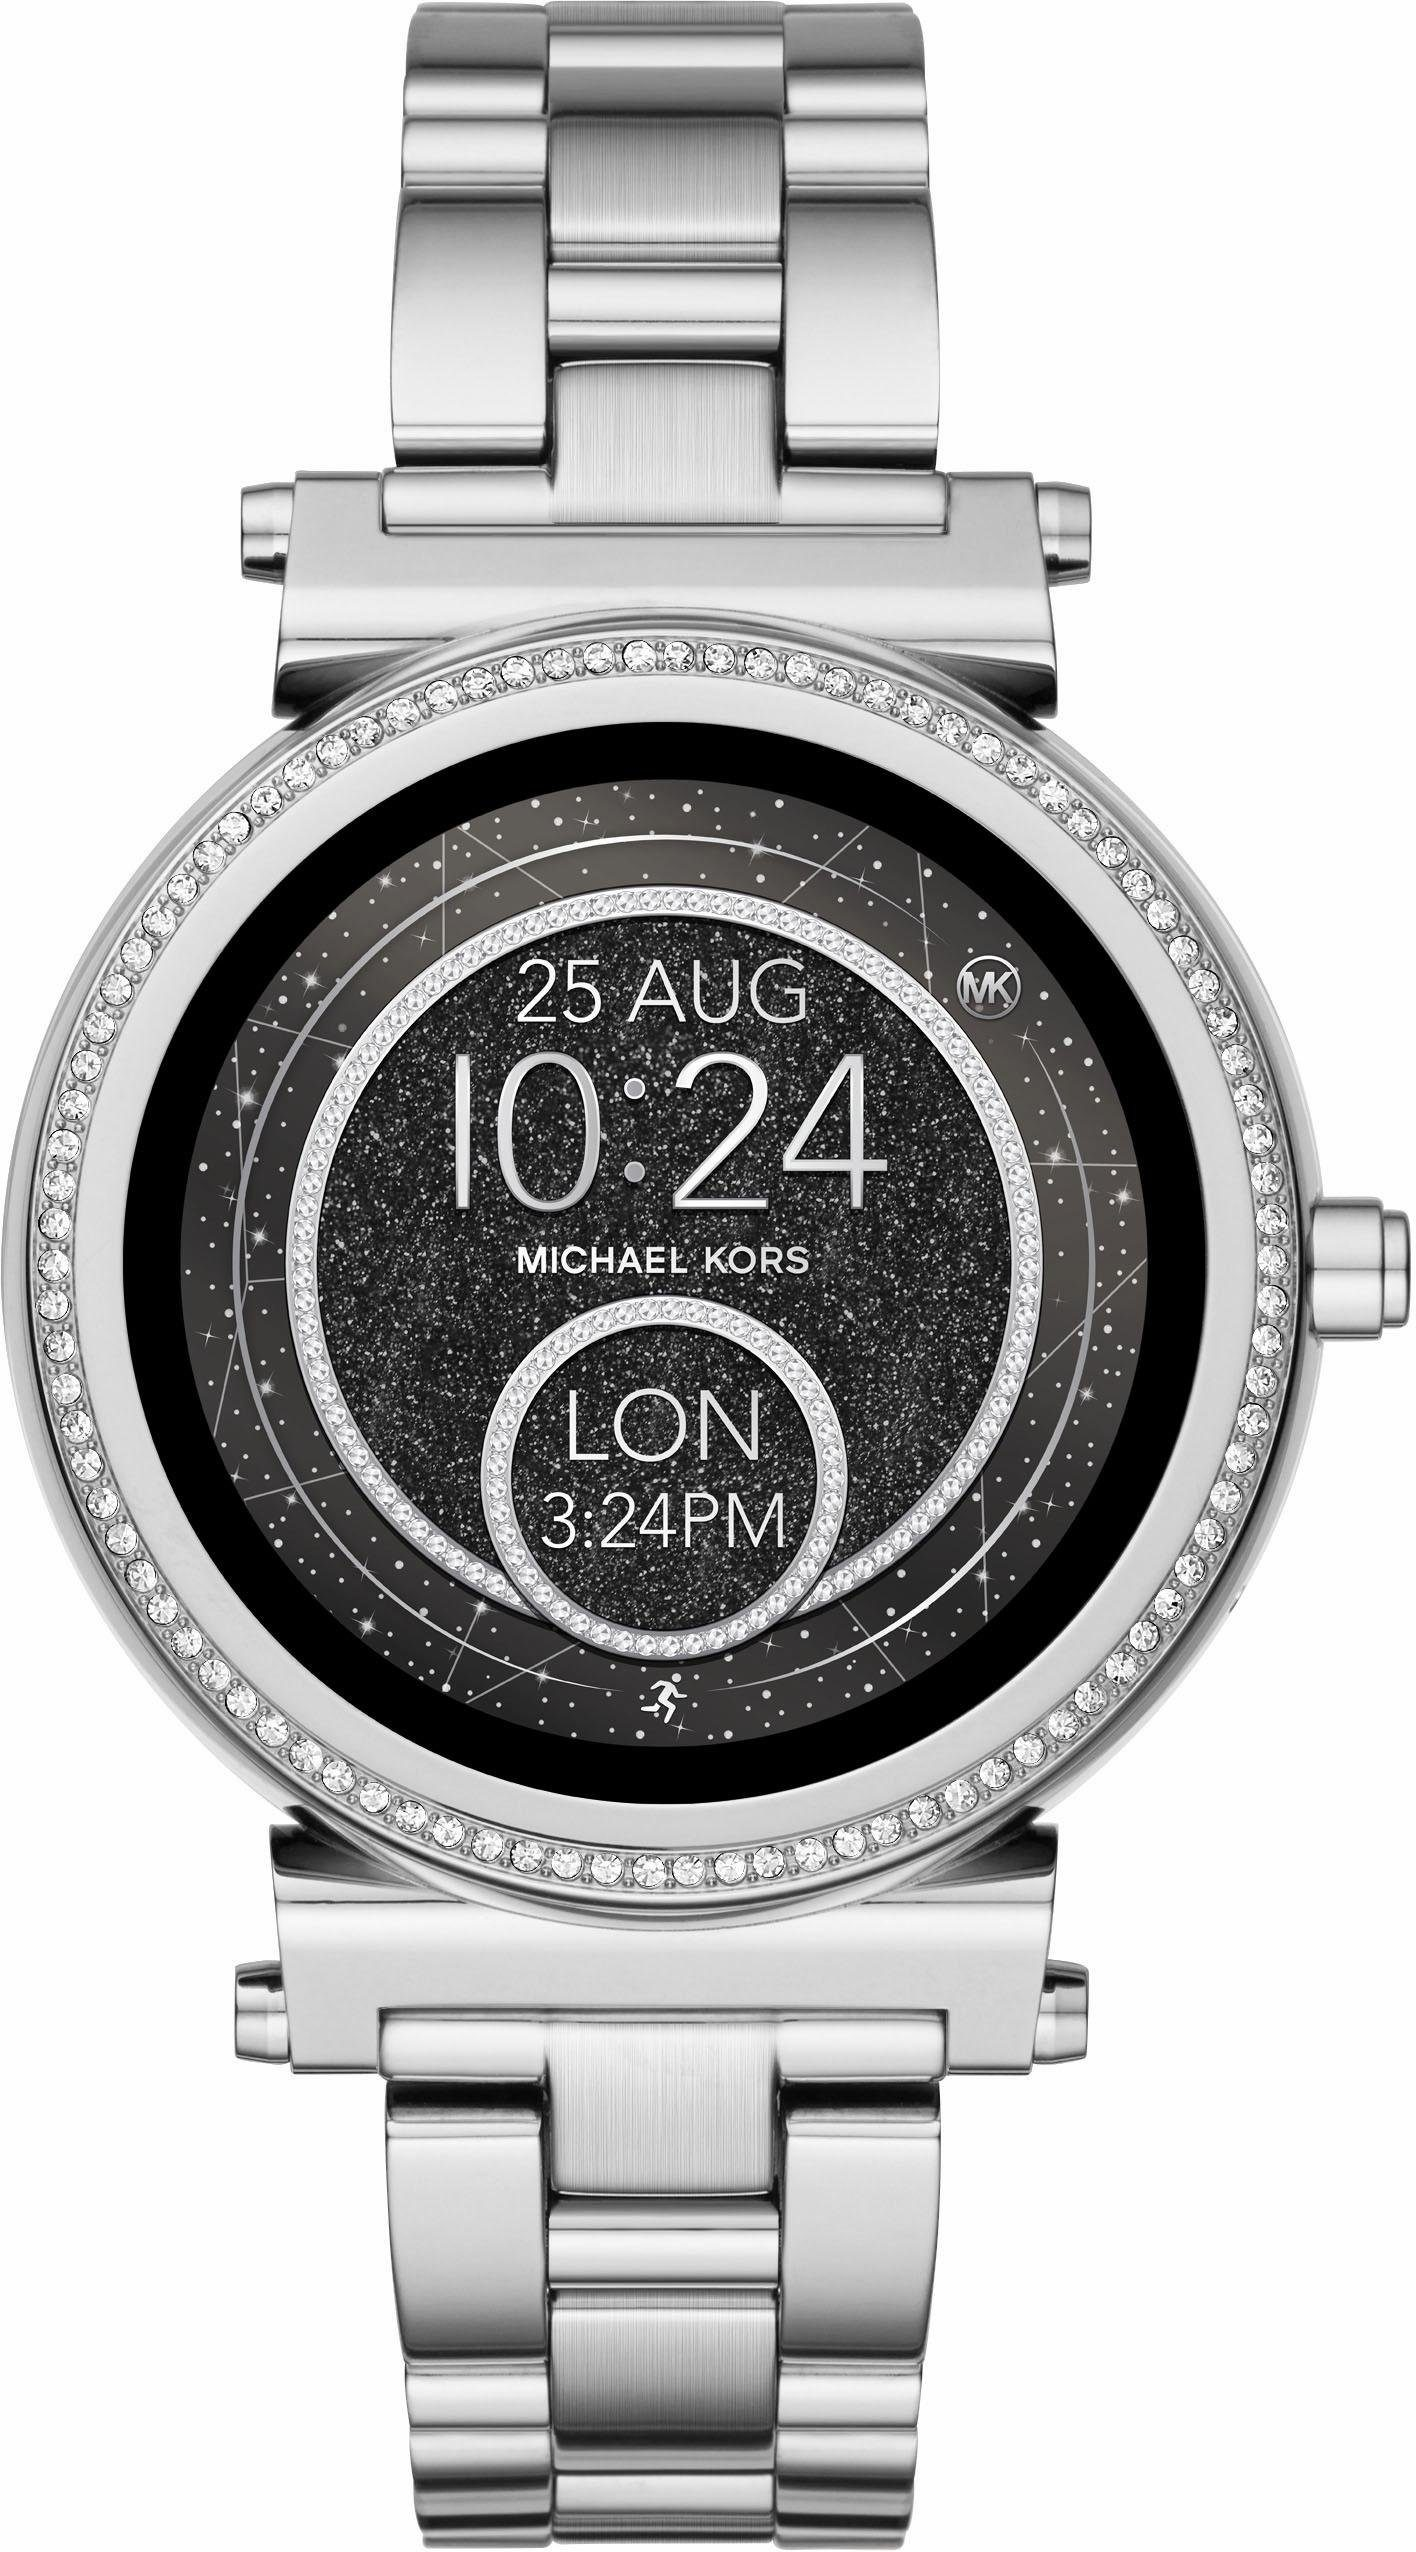 MICHAEL KORS ACCESS SOFIE, MKT5020 Smartwatch (Android Wear, inkl. Dornschließe für Wechselband)